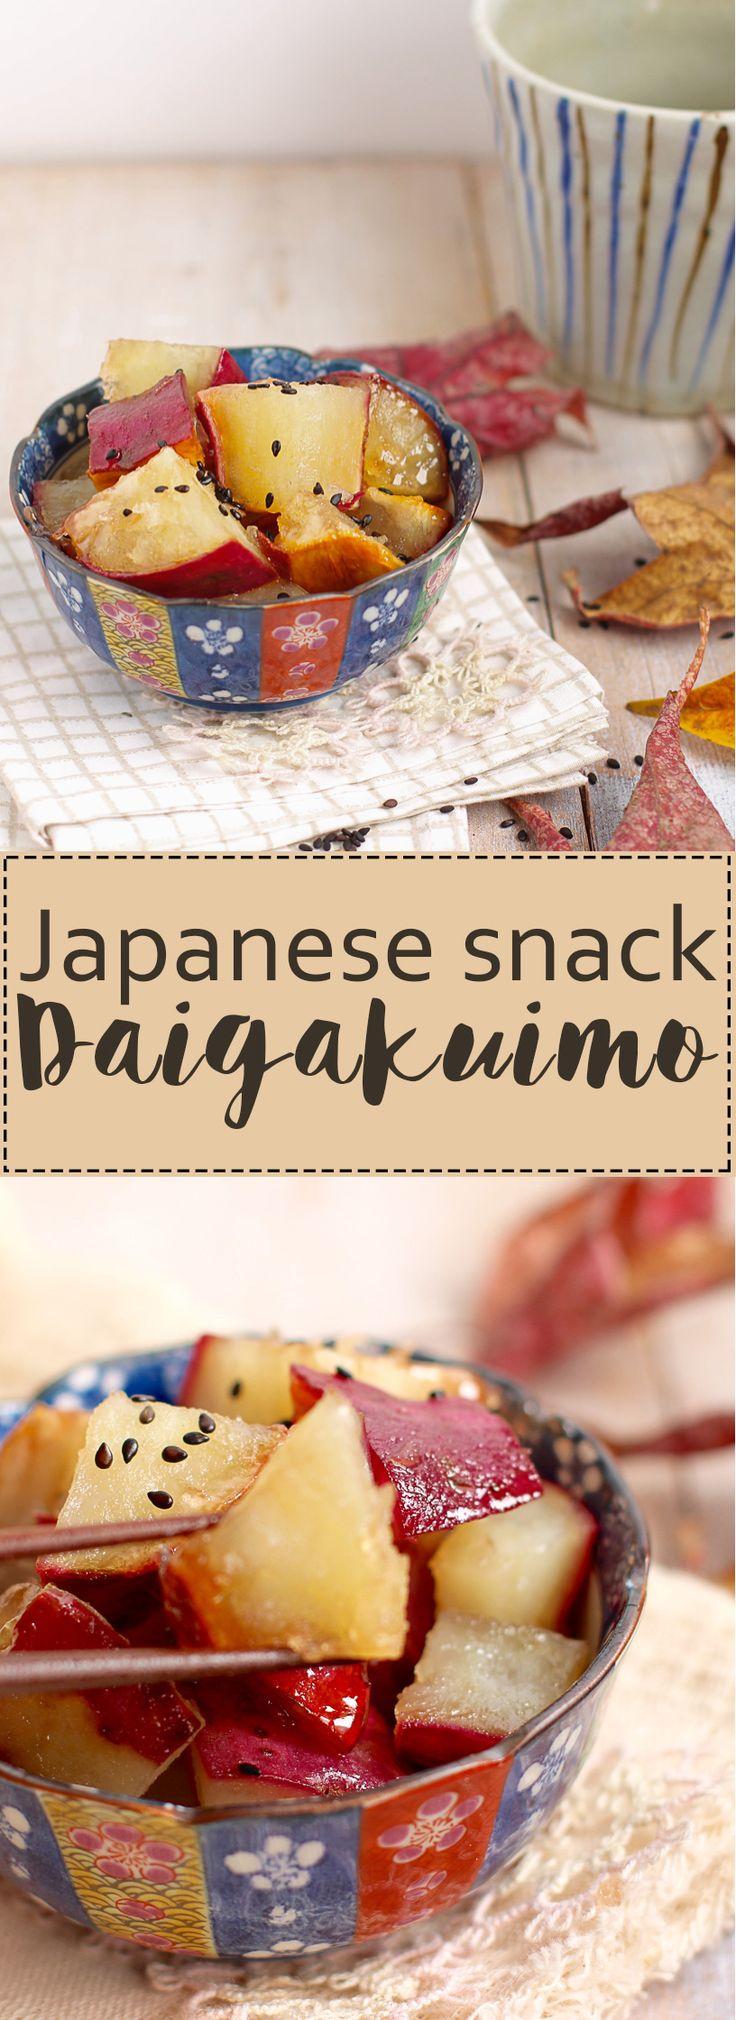 Japanese healthy snack: sweet potato bite